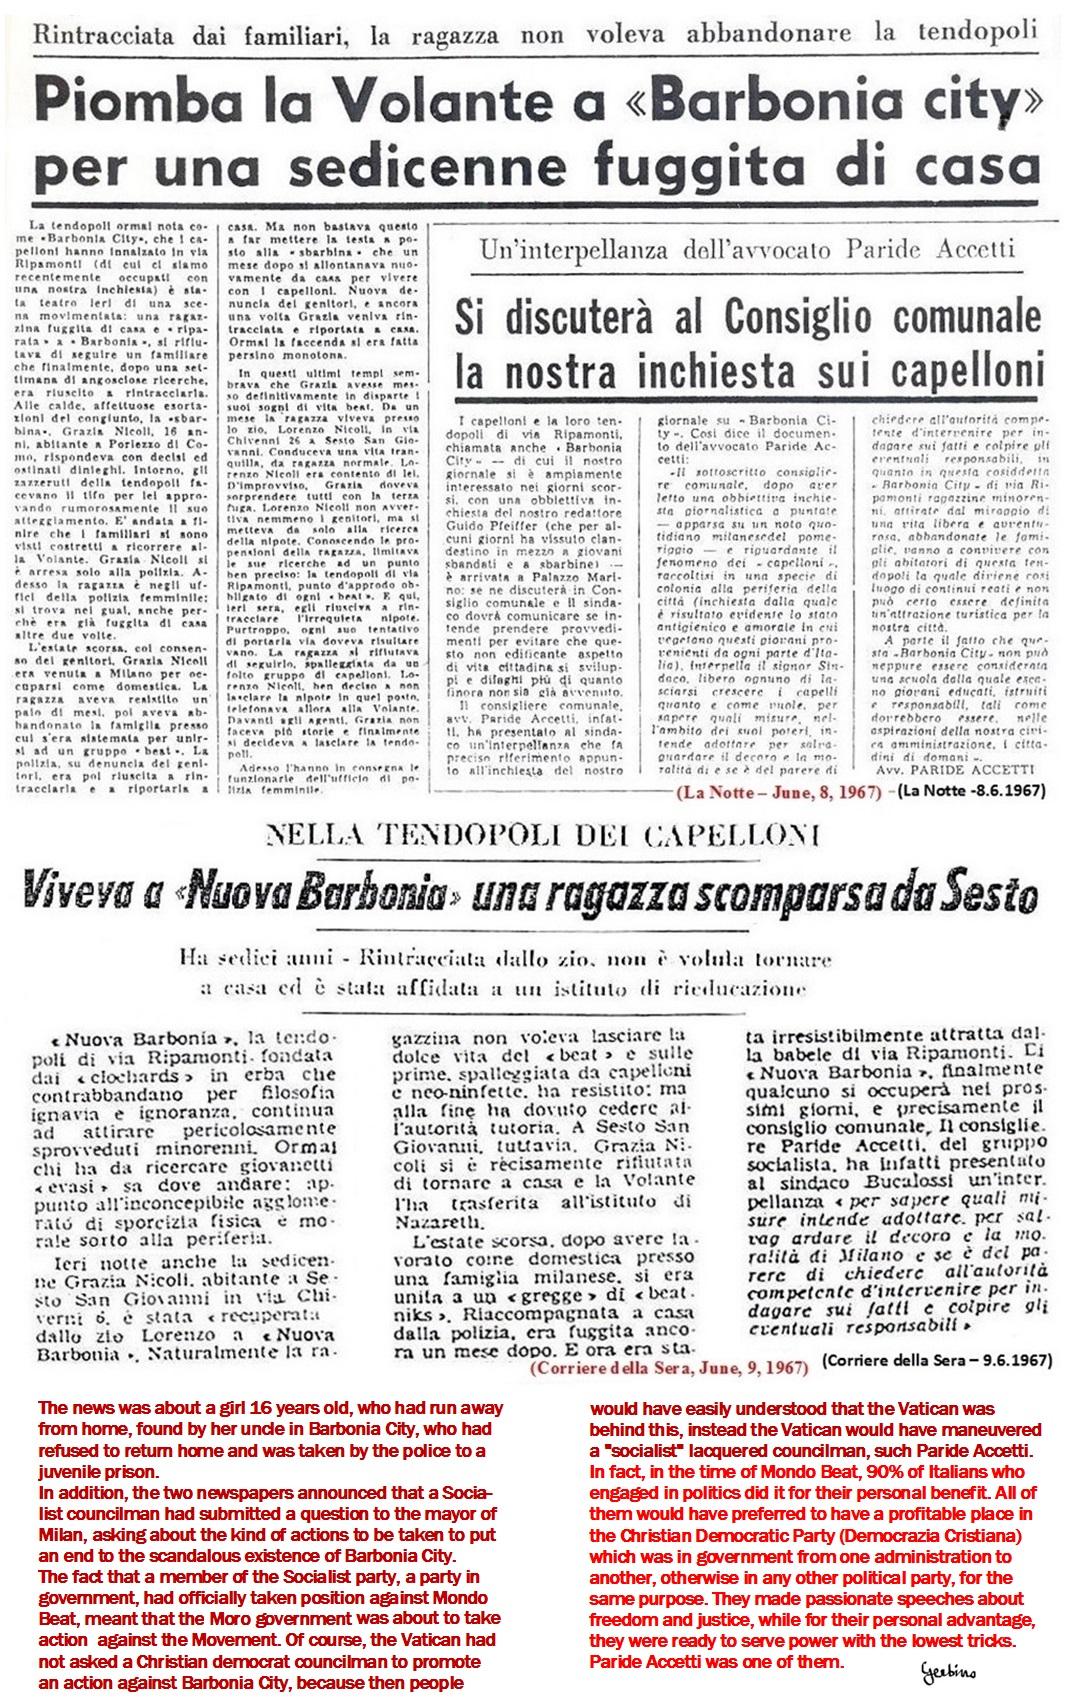 The Vatican maneuvered a socialist councilman, Paride Accetti, against Mondo Beat